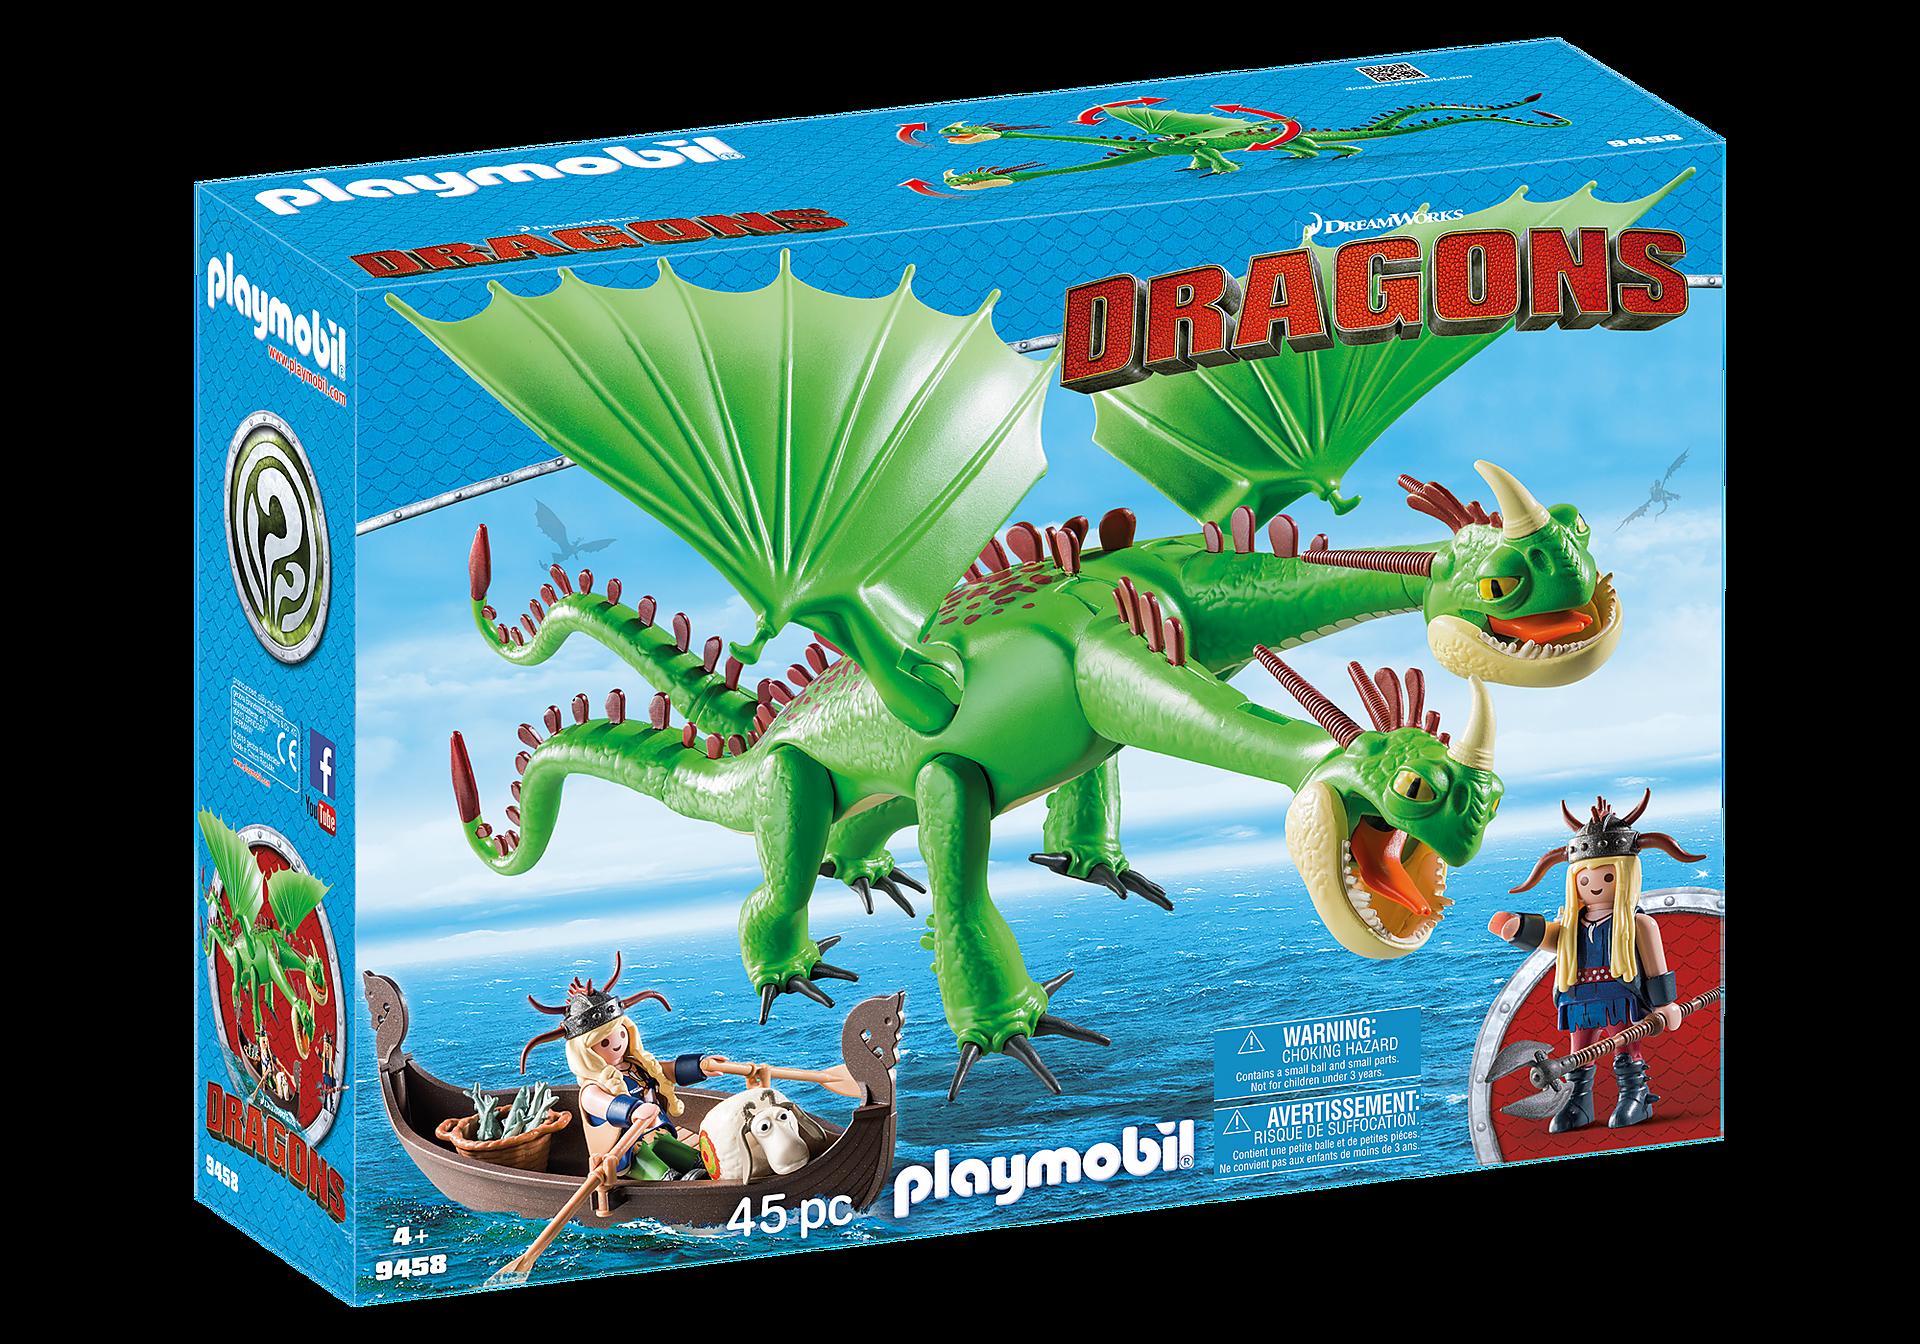 http://media.playmobil.com/i/playmobil/9458_product_box_front/Raffnuss und Taffnuss mit Kotz und Würg